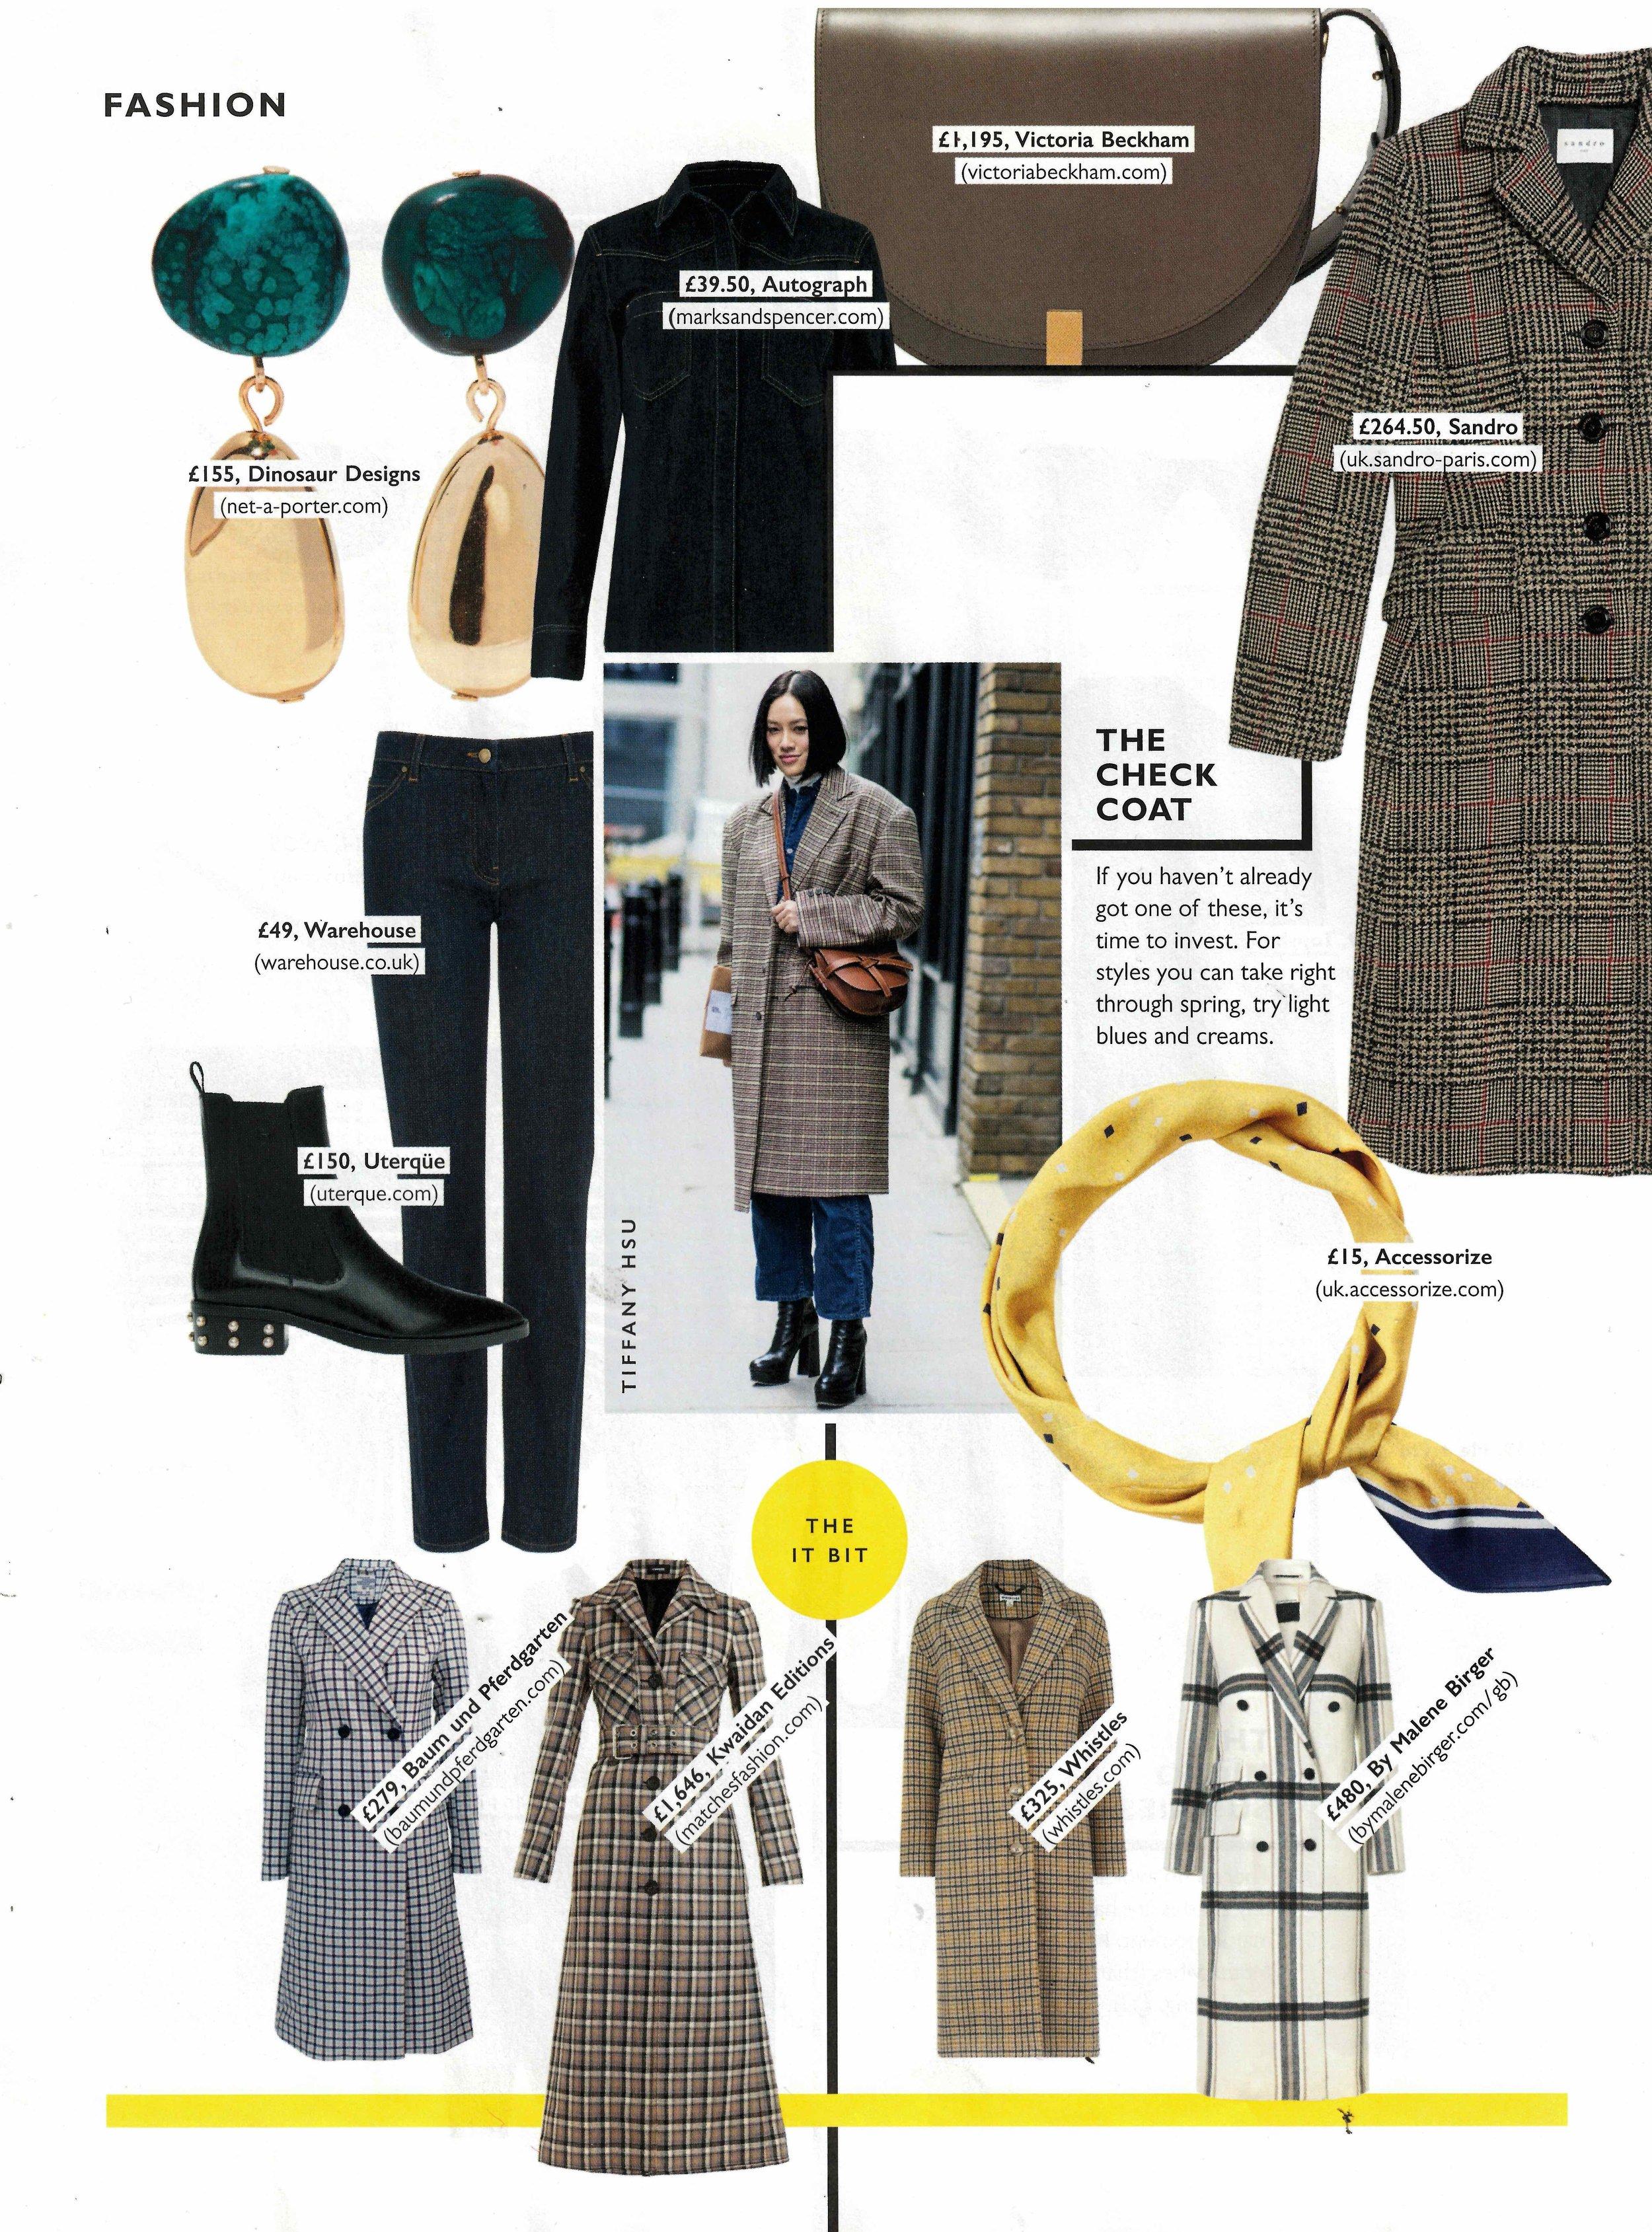 05.03.18 Grazia Magazine - 1.jpg